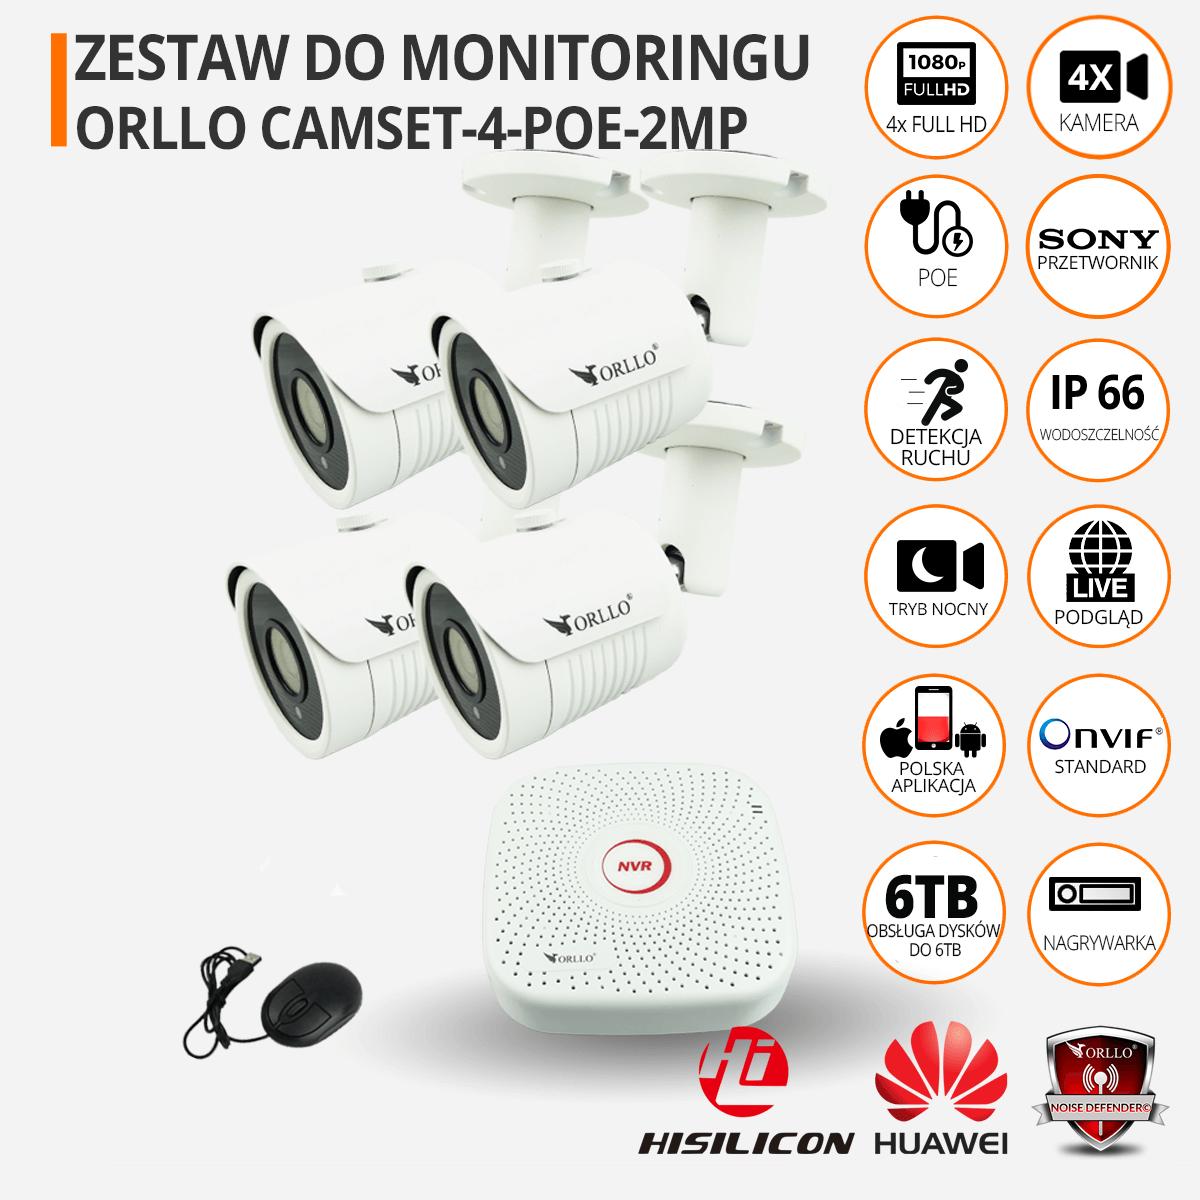 zestaw-kamera-domonitoringu-CAMSET-funkcje-orllo-pl